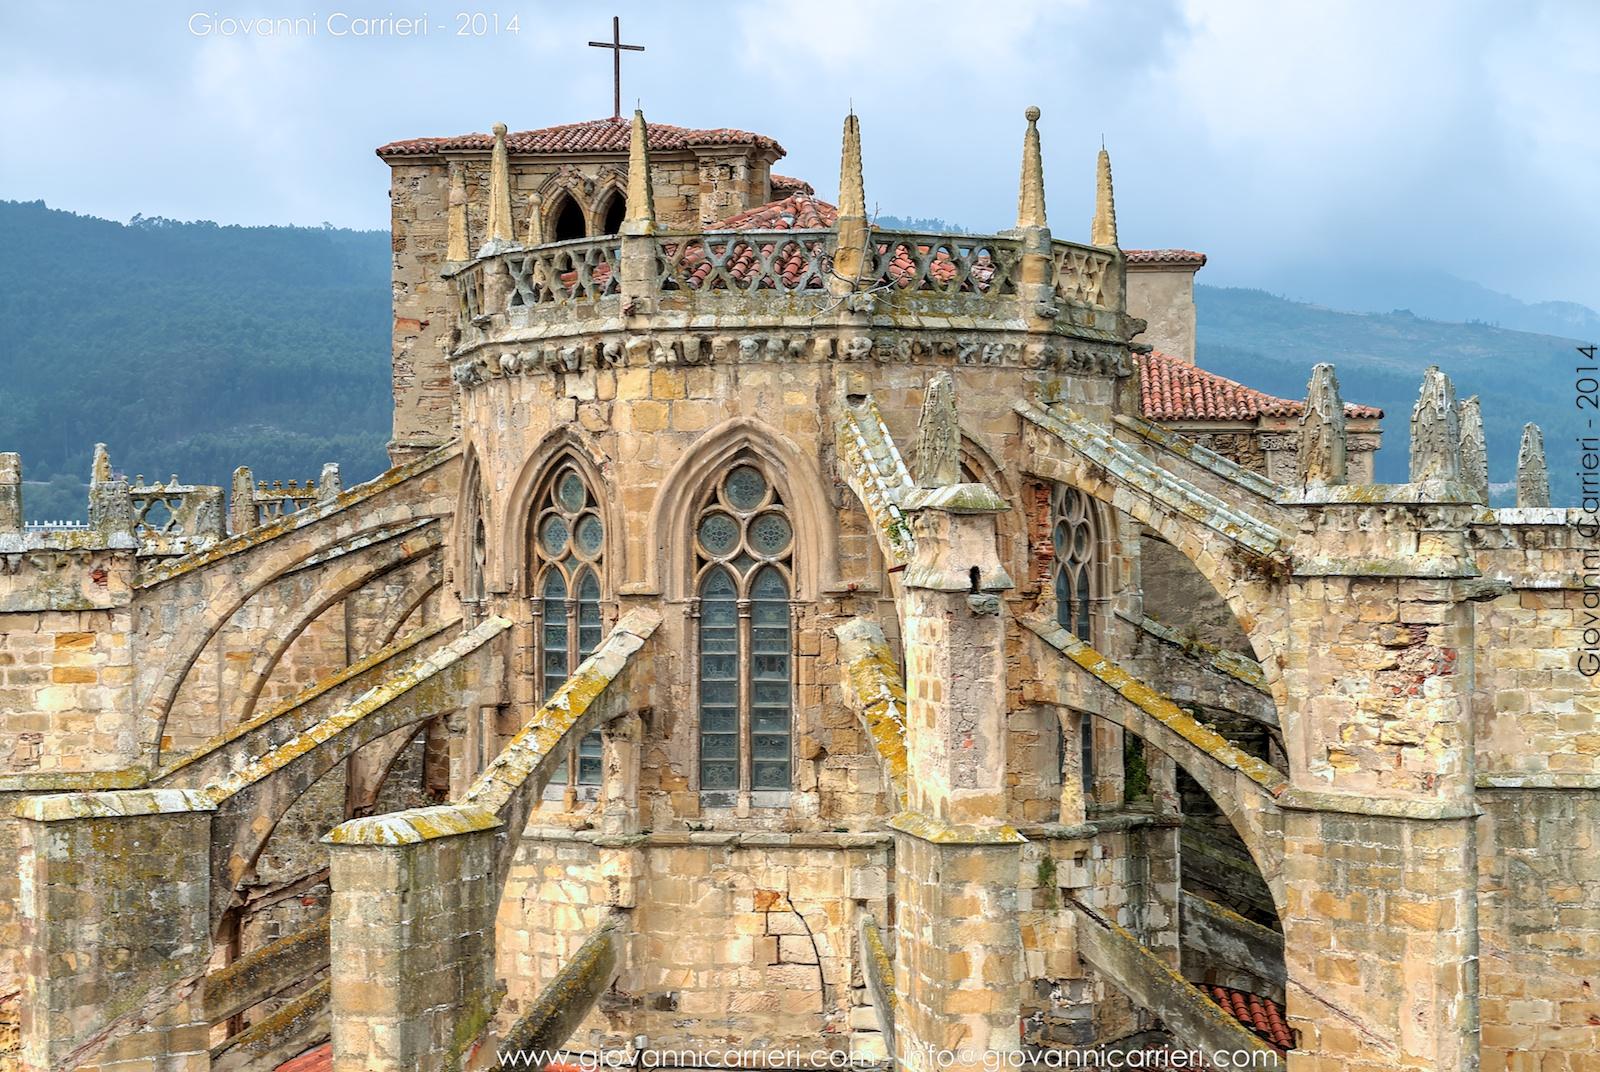 Santa Maria dell'Assunta - Castro Urdiales Spagna